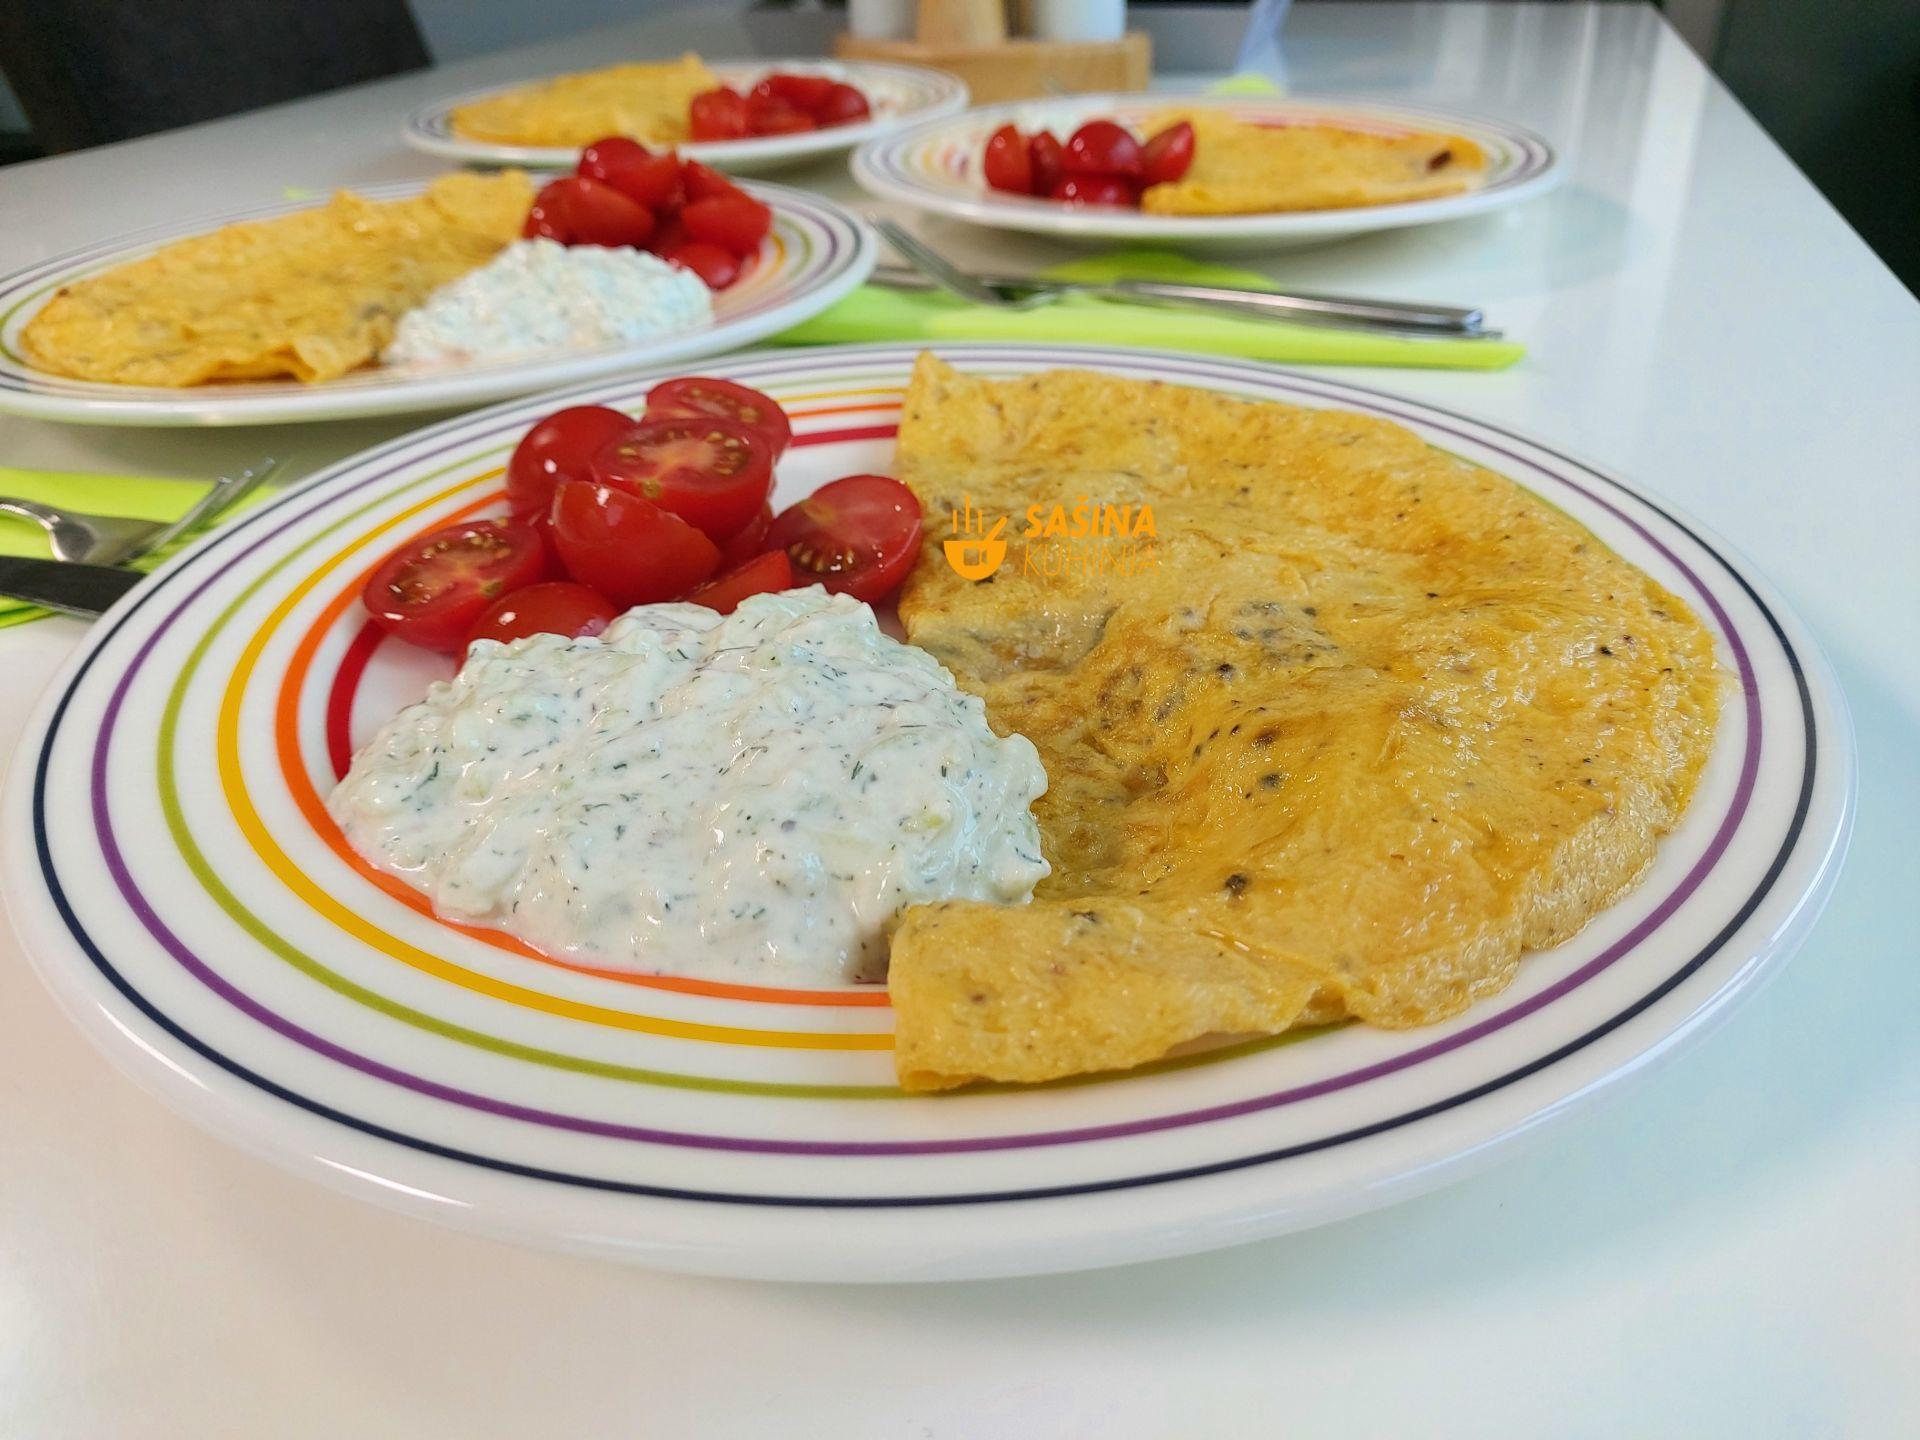 dobar omlet recept sašina kuhinja omlet sa sampinjonima sirom i slaninom ili pancetom